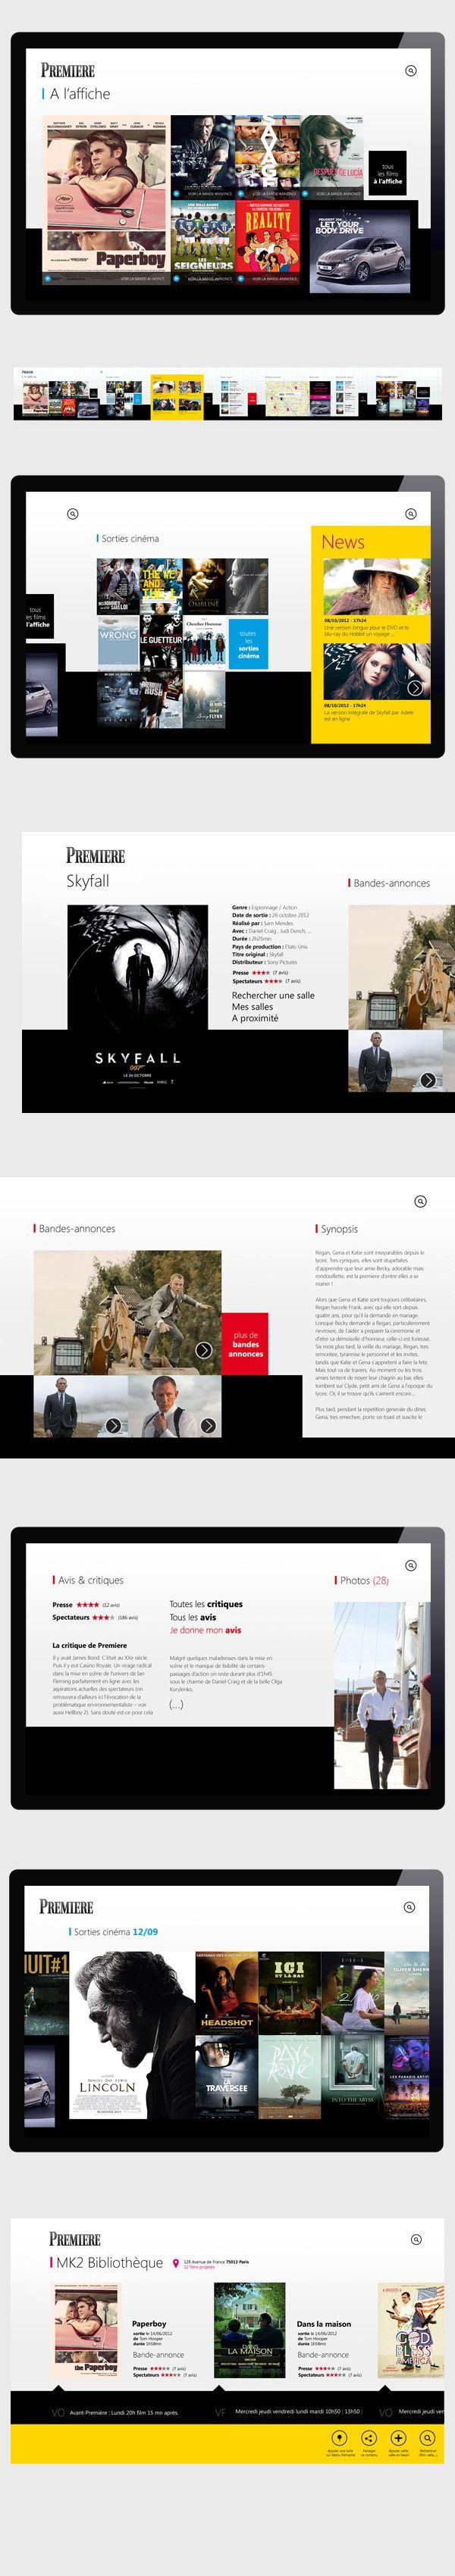 Premiere // Windows 8 by Fabien Stimulak, via Behance